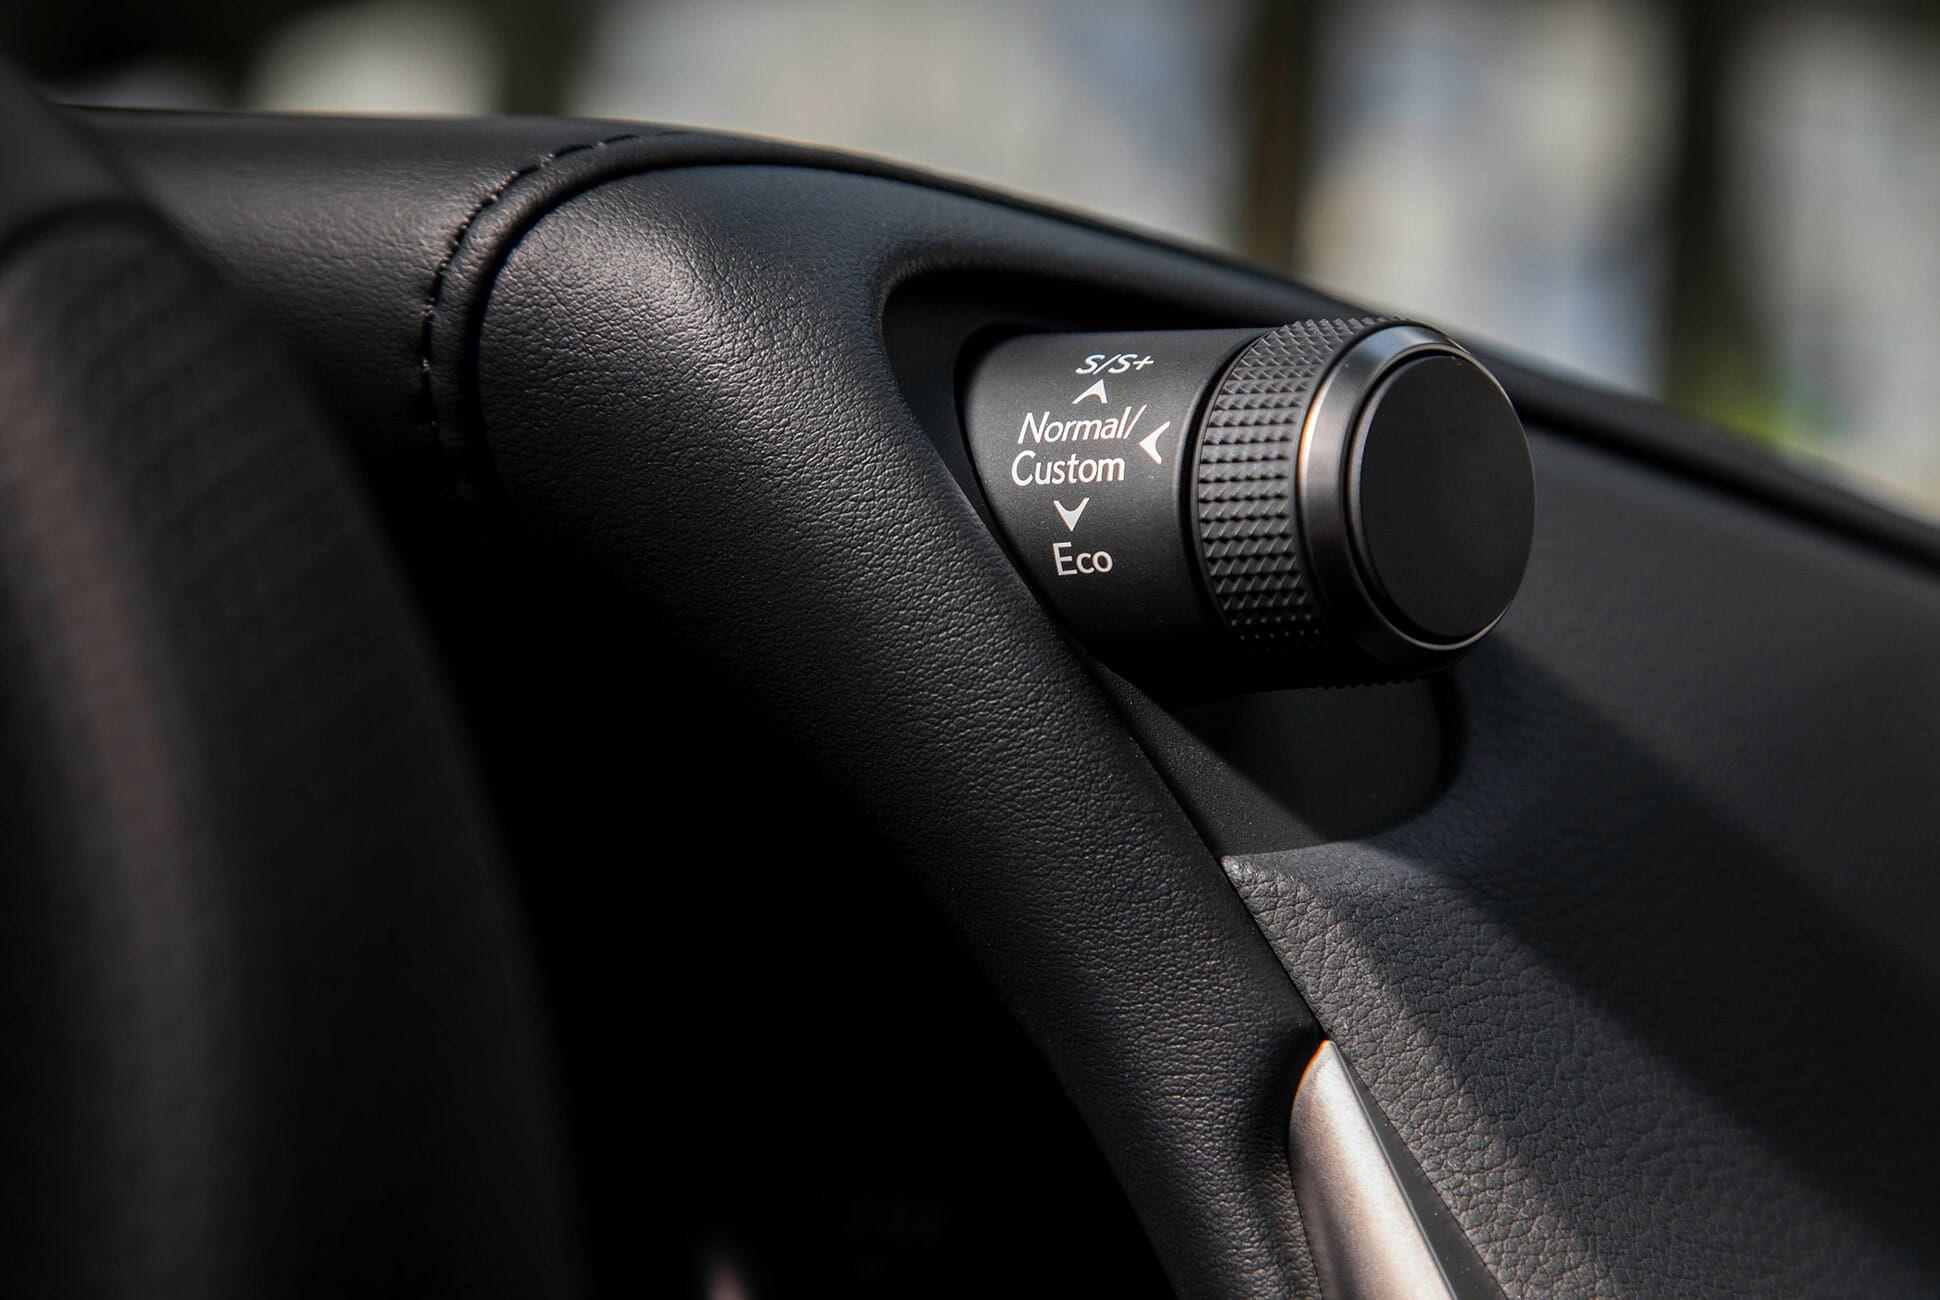 2019-Lexus-ES-350-F-Sport-Review-gear-patrol-slide-15